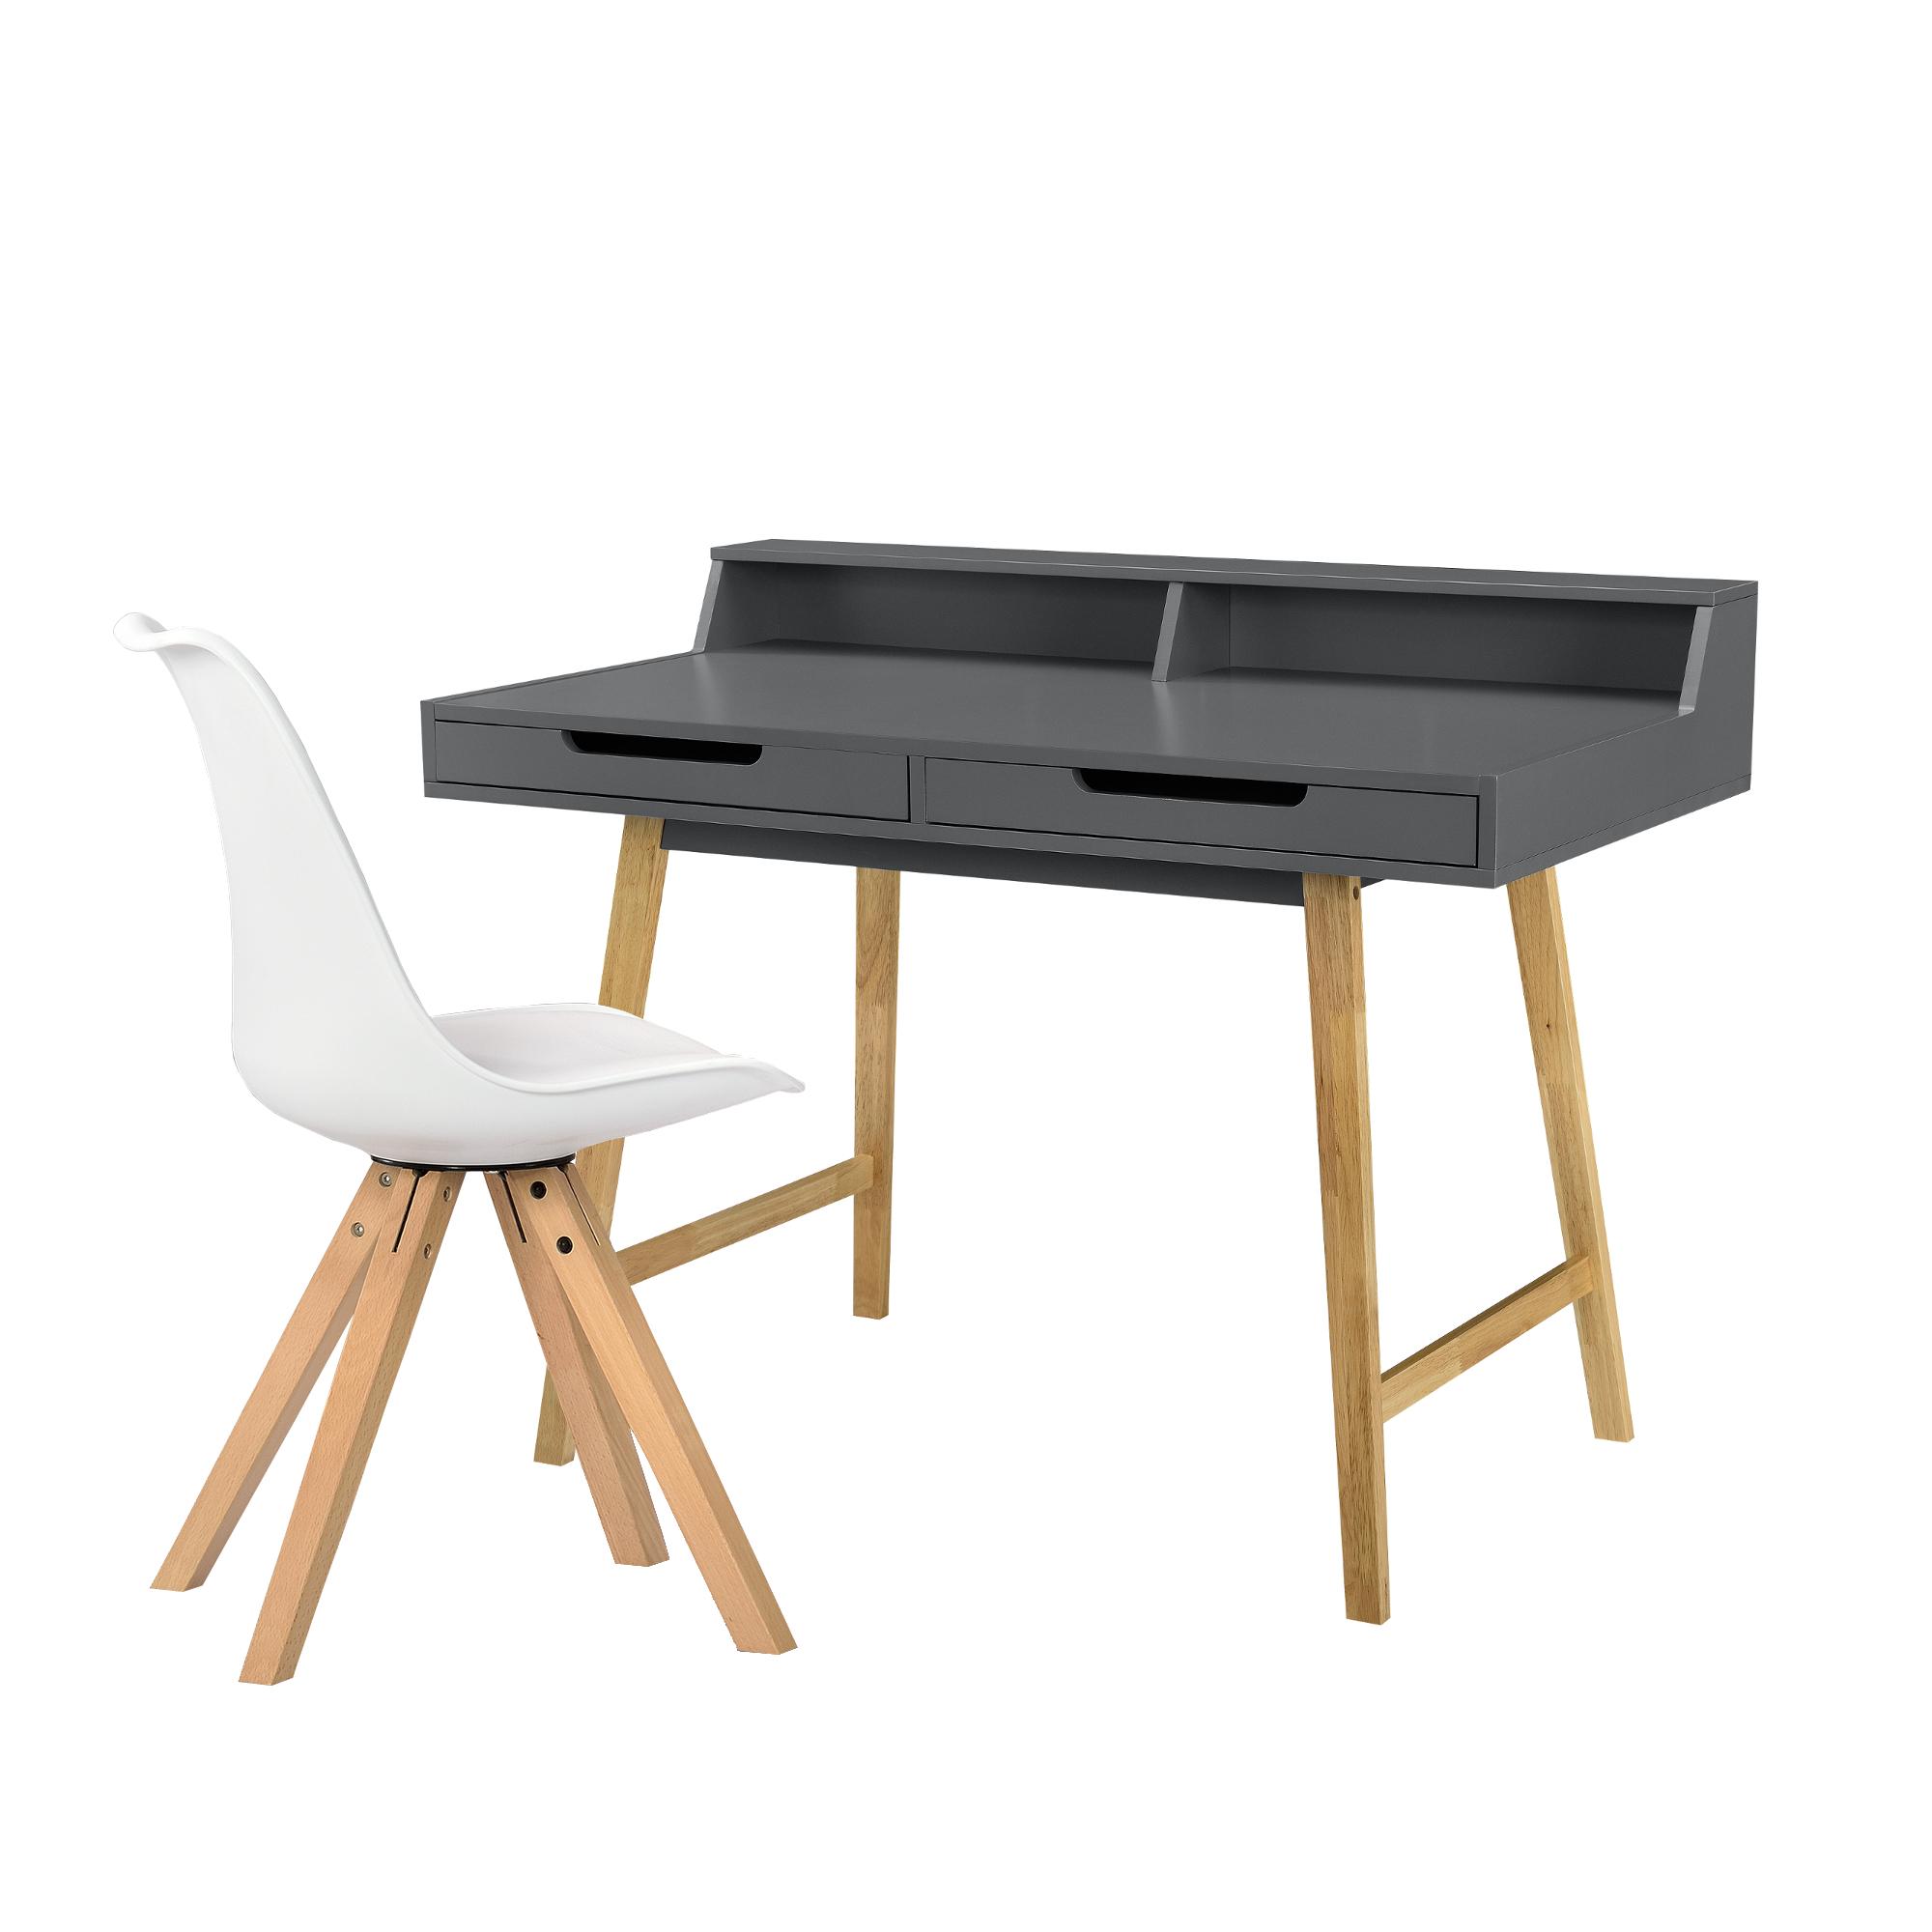 [en.casa]® Birou design retro Bremen, cu 2 sertare si 1 scaun, MDF/lemn fag/plastic, 85 x 110 x 60 cm, gri/alb